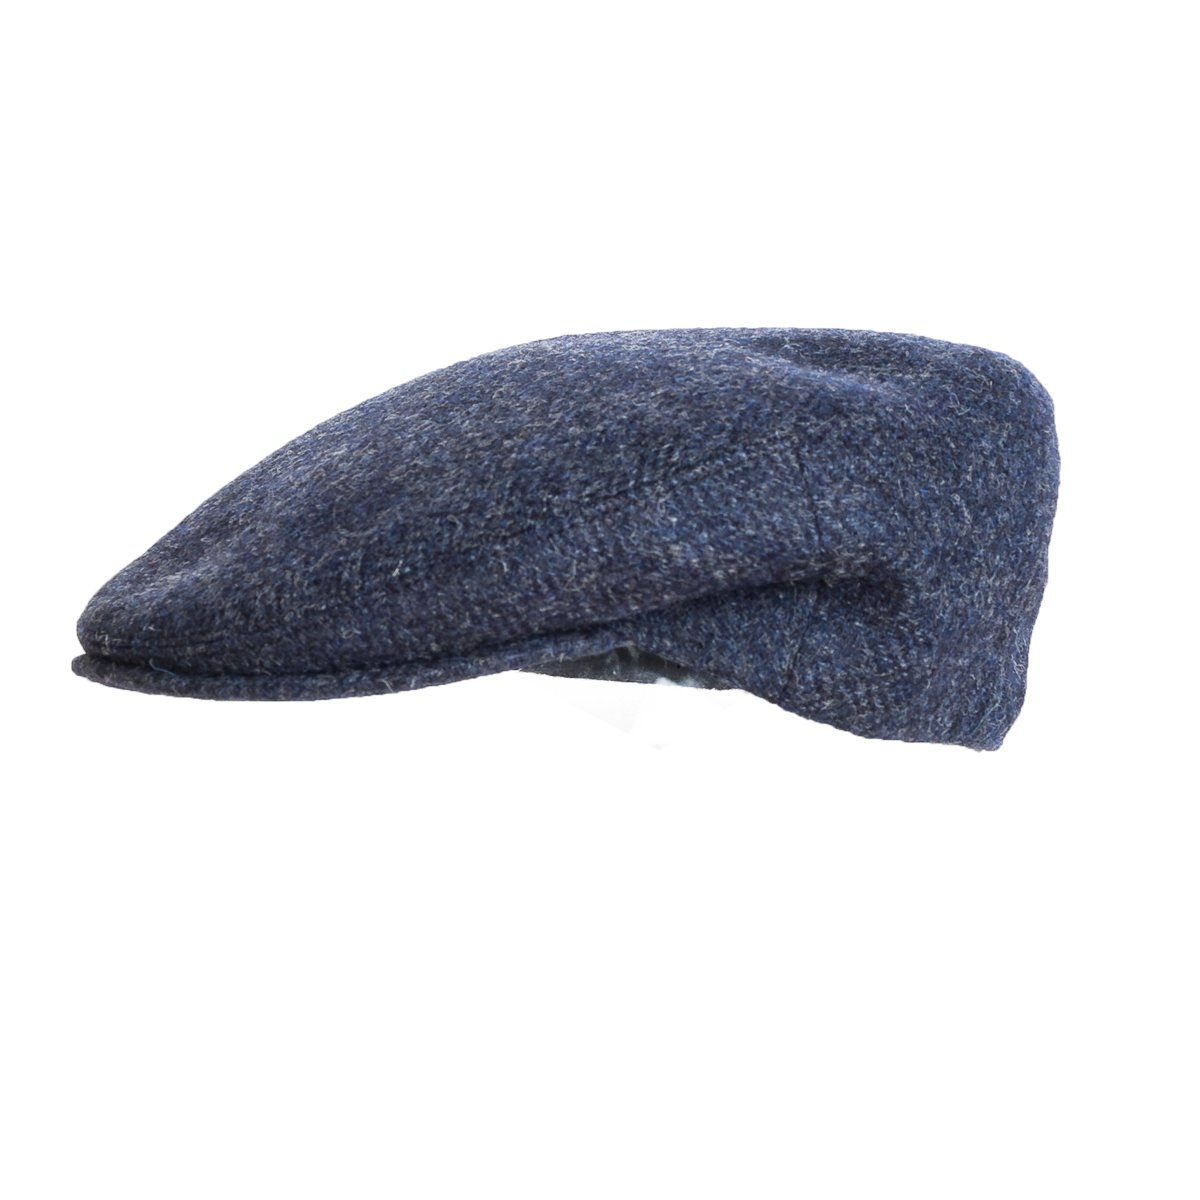 Blue Donegal Tweed Flat Cap